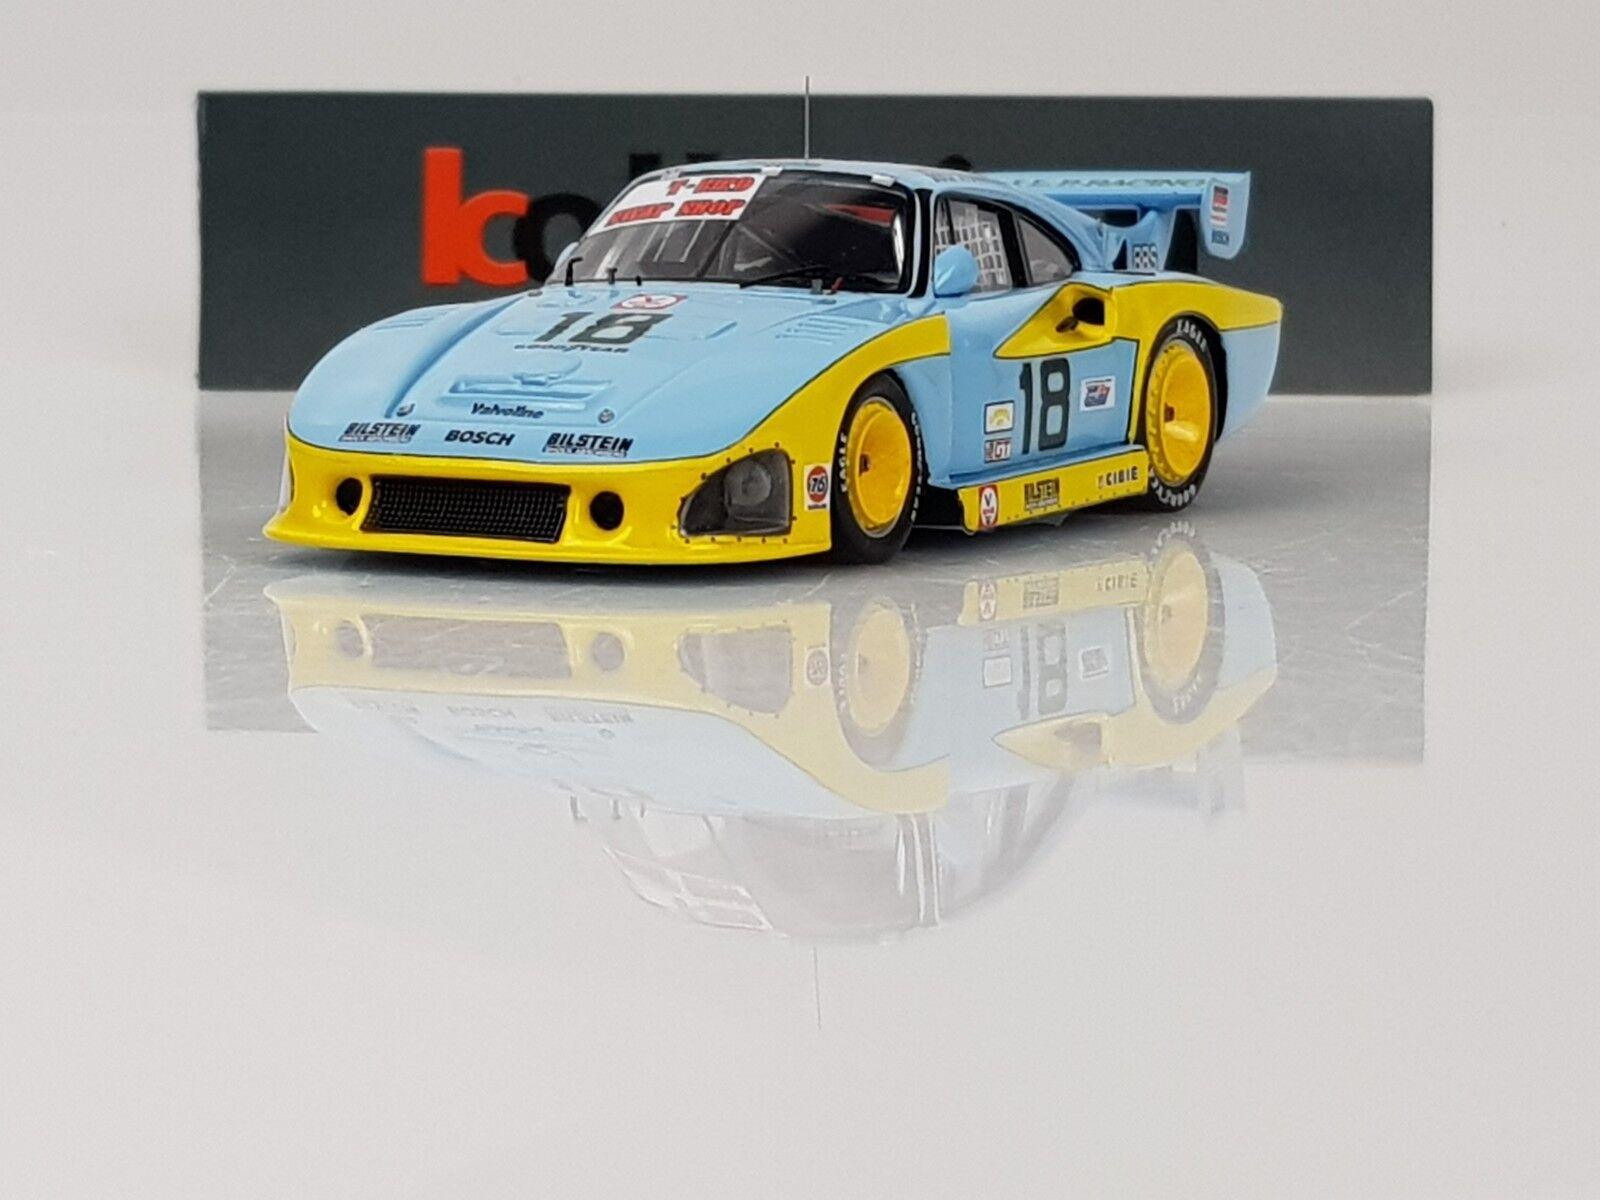 SPARK S1928 Porsche 935 JLP n°18 Winner 24H  Daytona 1982 1.43 NB  offres de vente